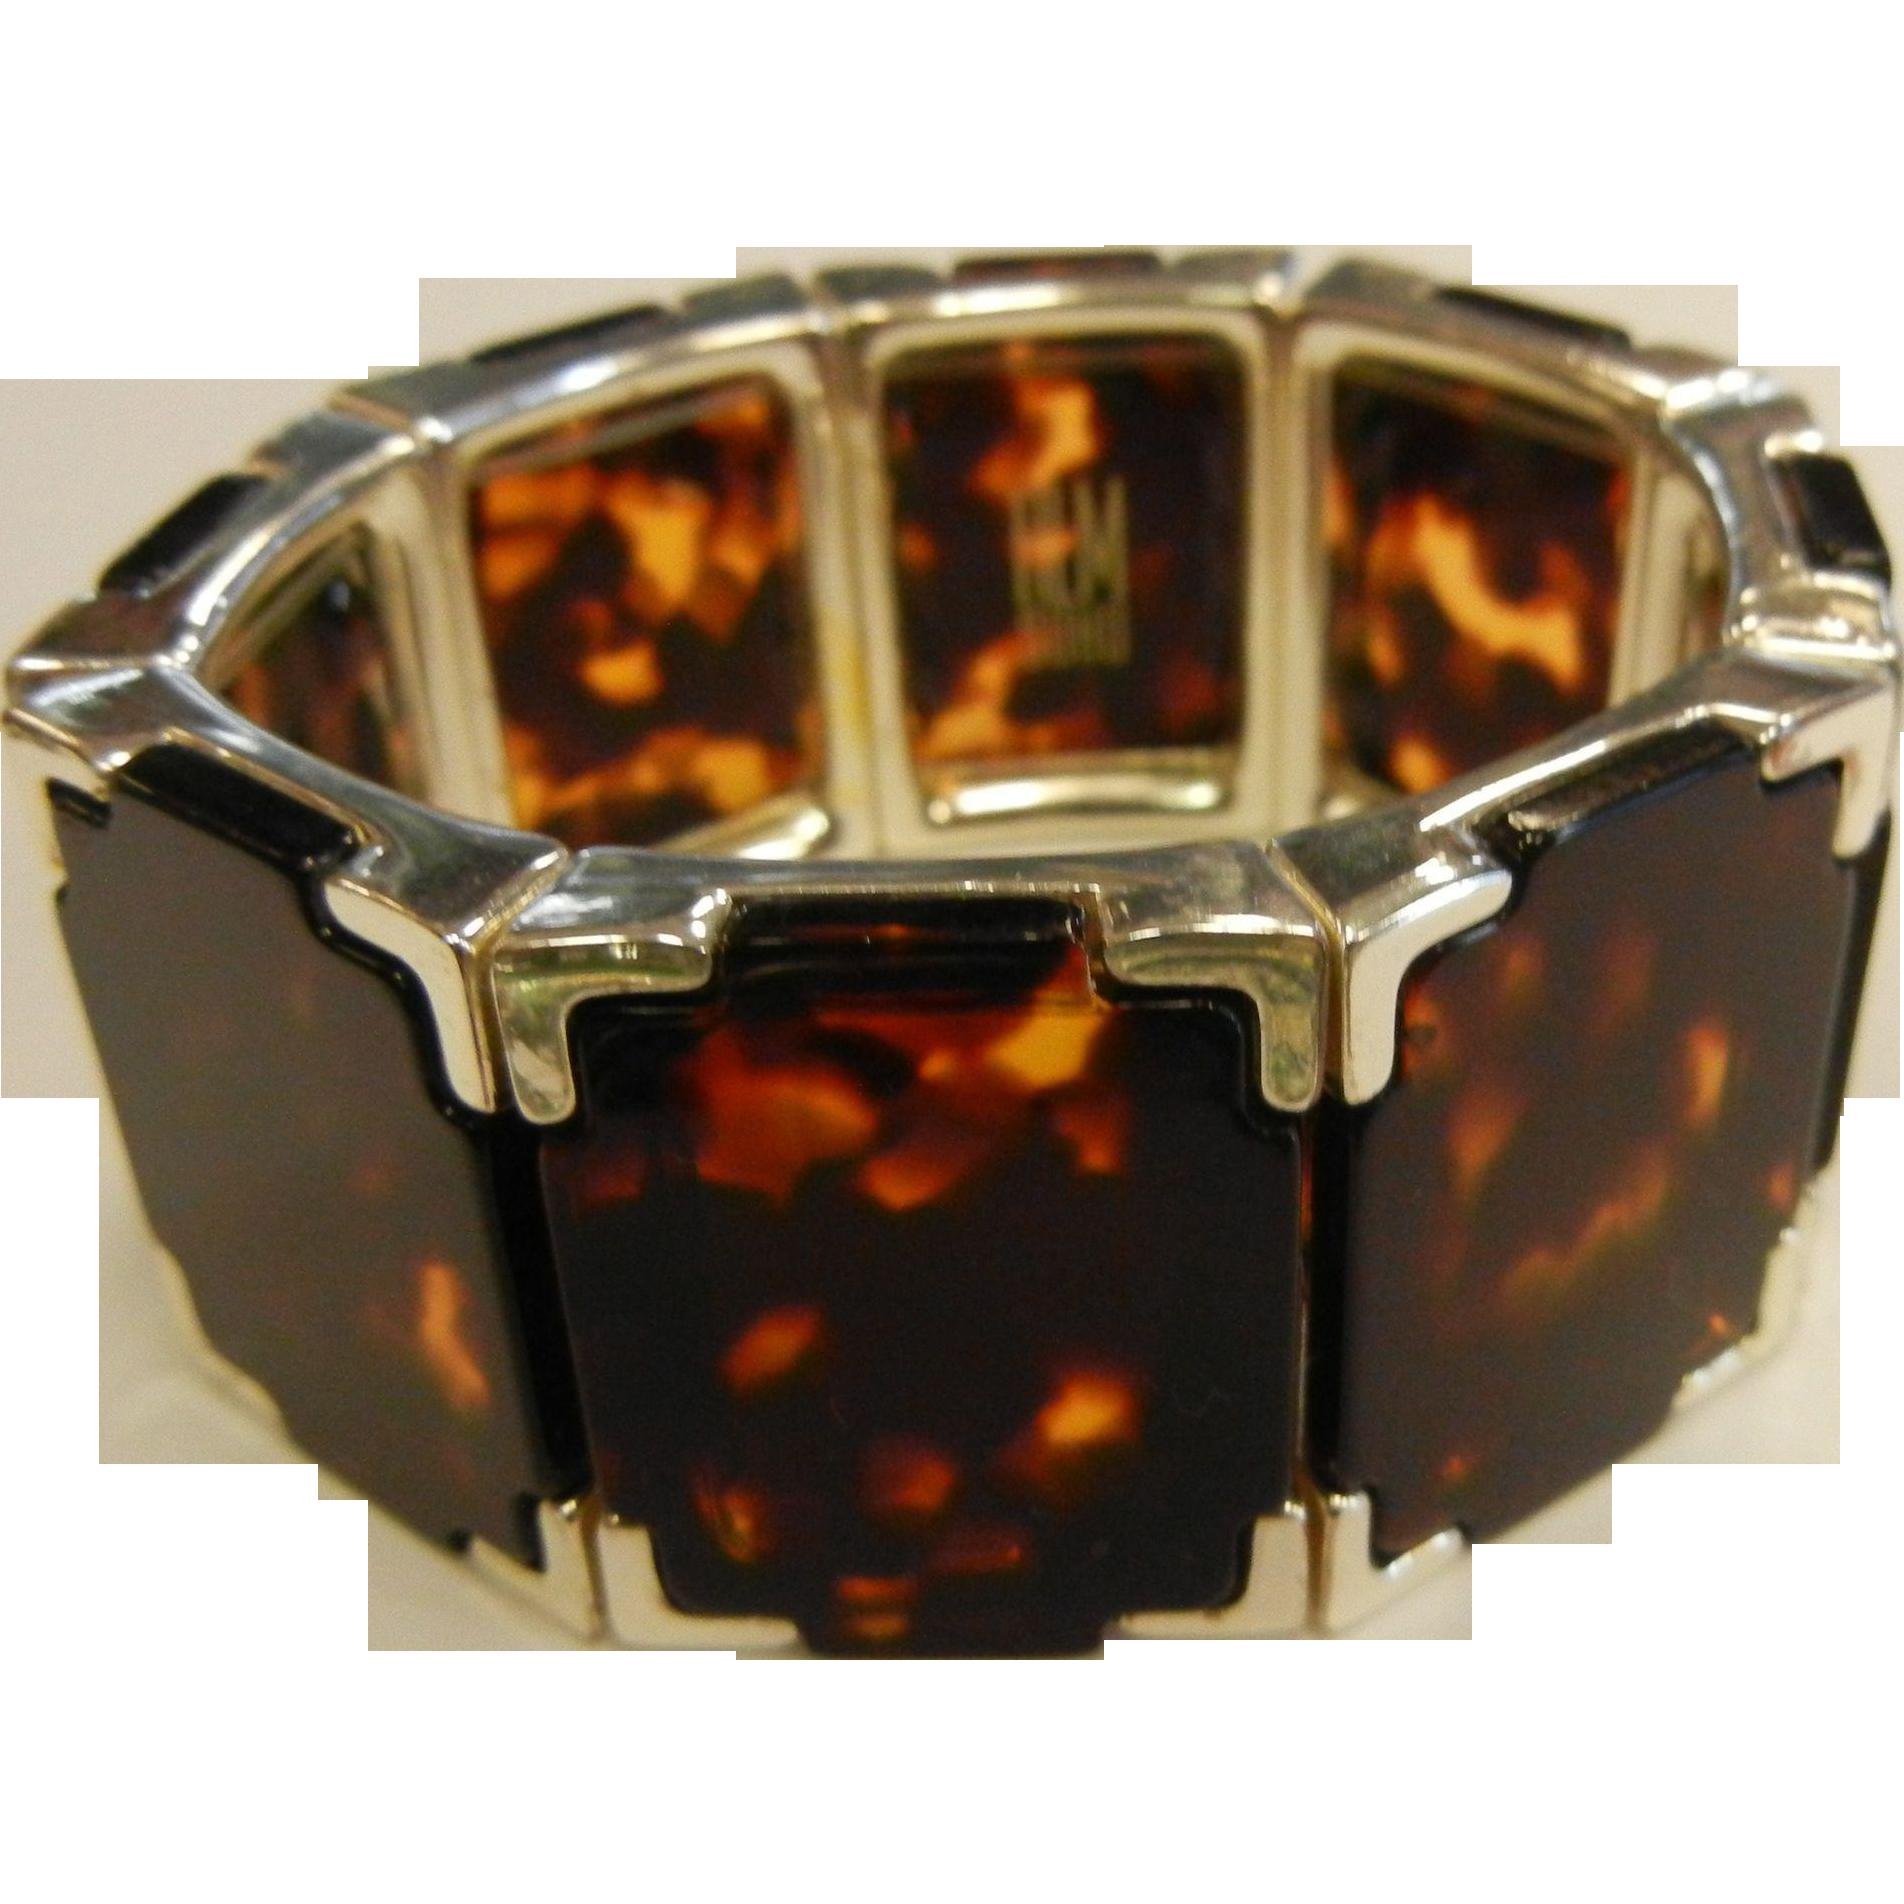 Modern Stretch Bracelet w/ Framed Faux-Tortoise Links